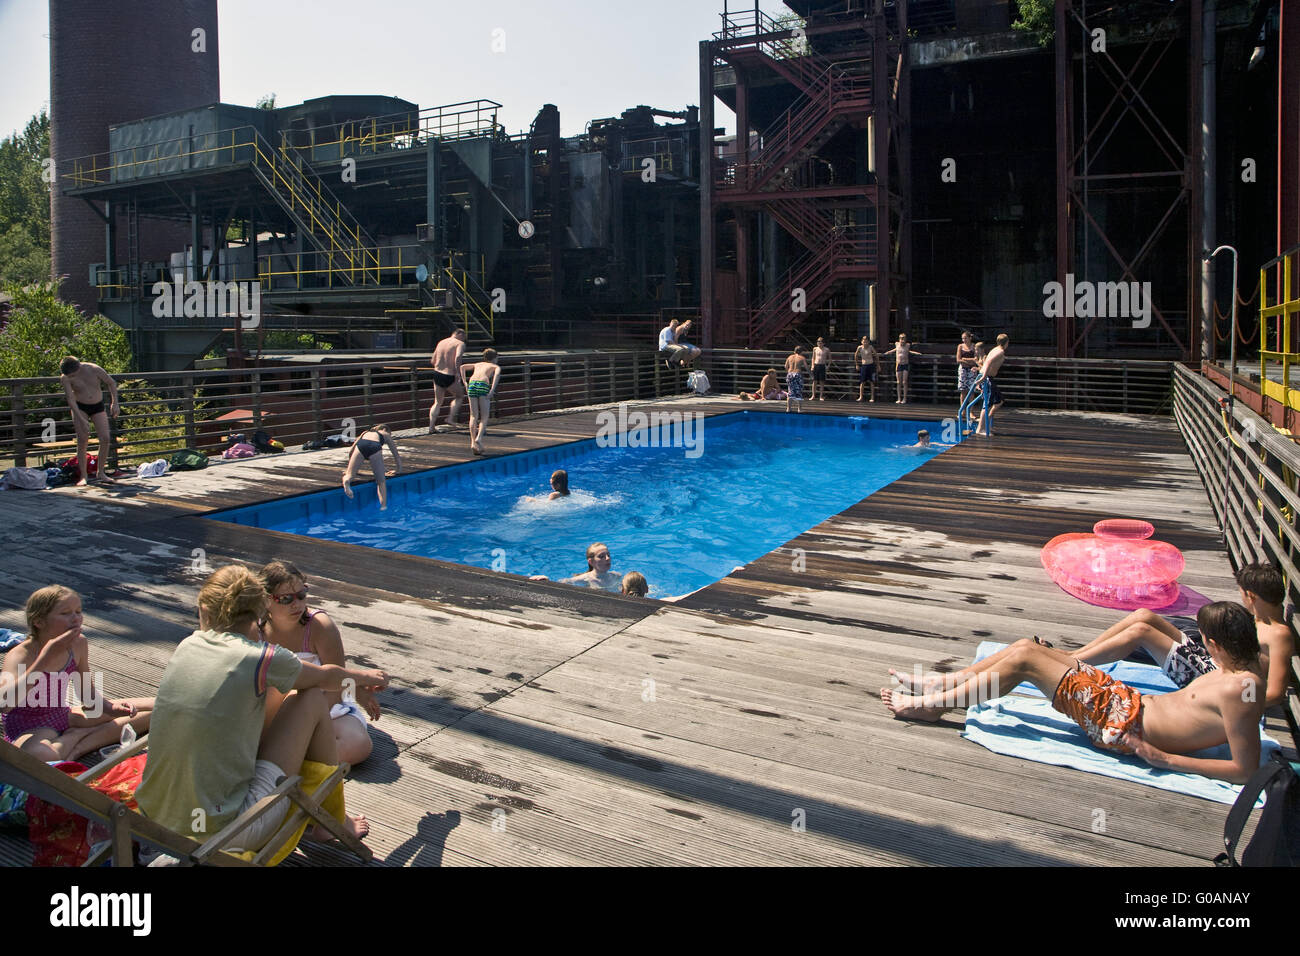 Factory swimming pool, Zollverein, Essen, Germany - Stock Image